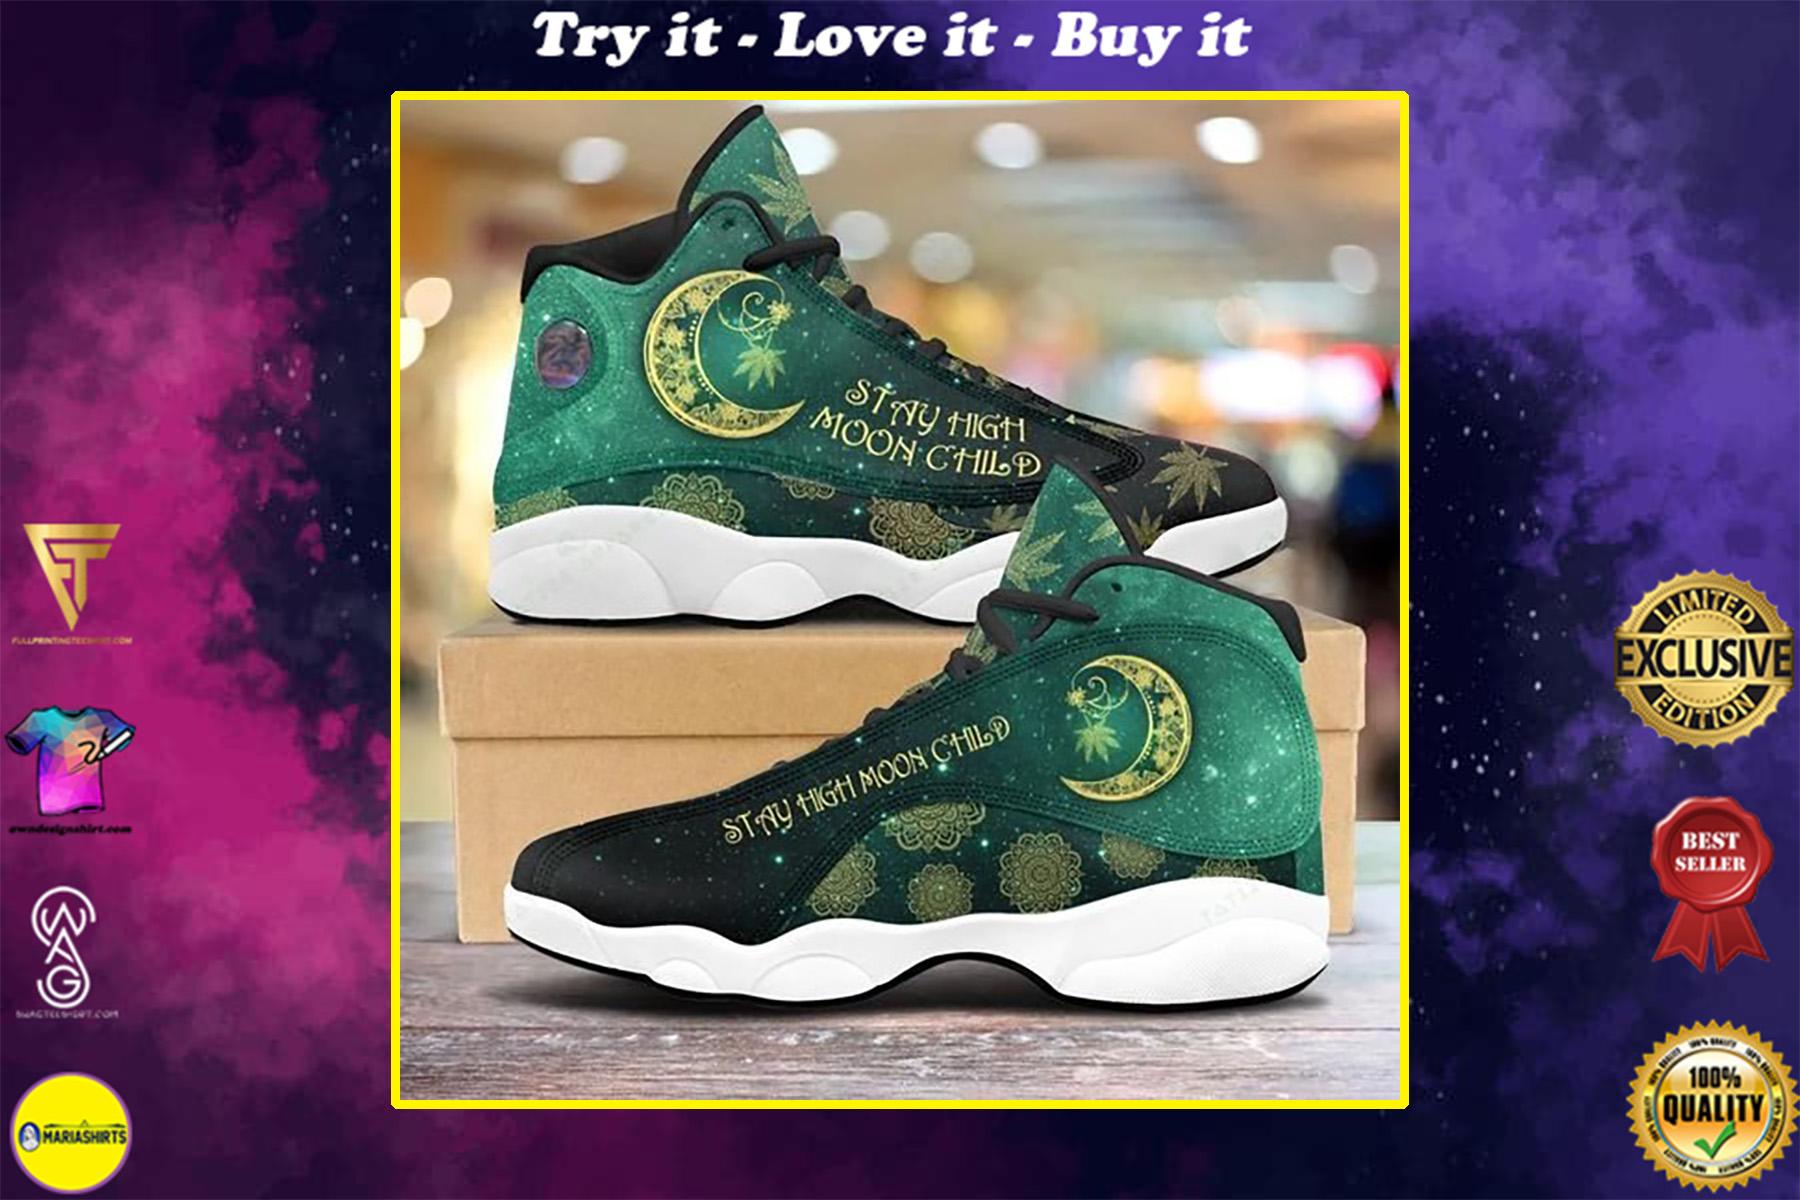 weed leaf stay high moon child all over printed air jordan 13 sneakers